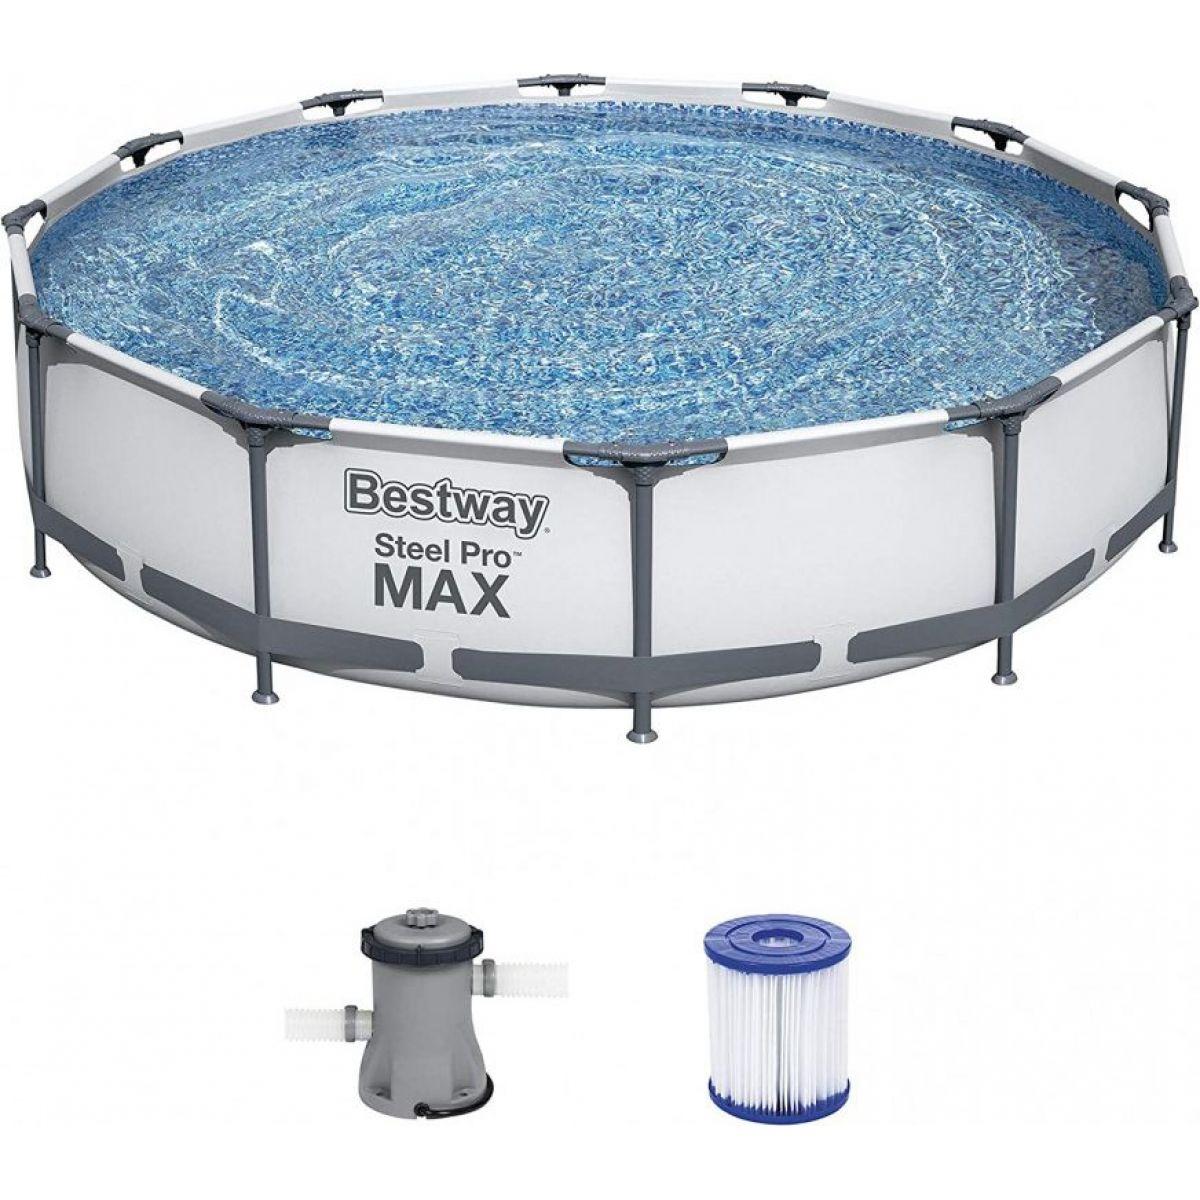 Bestway 56416 Bazén Steel Pro Max ™ 366 x 76 cm